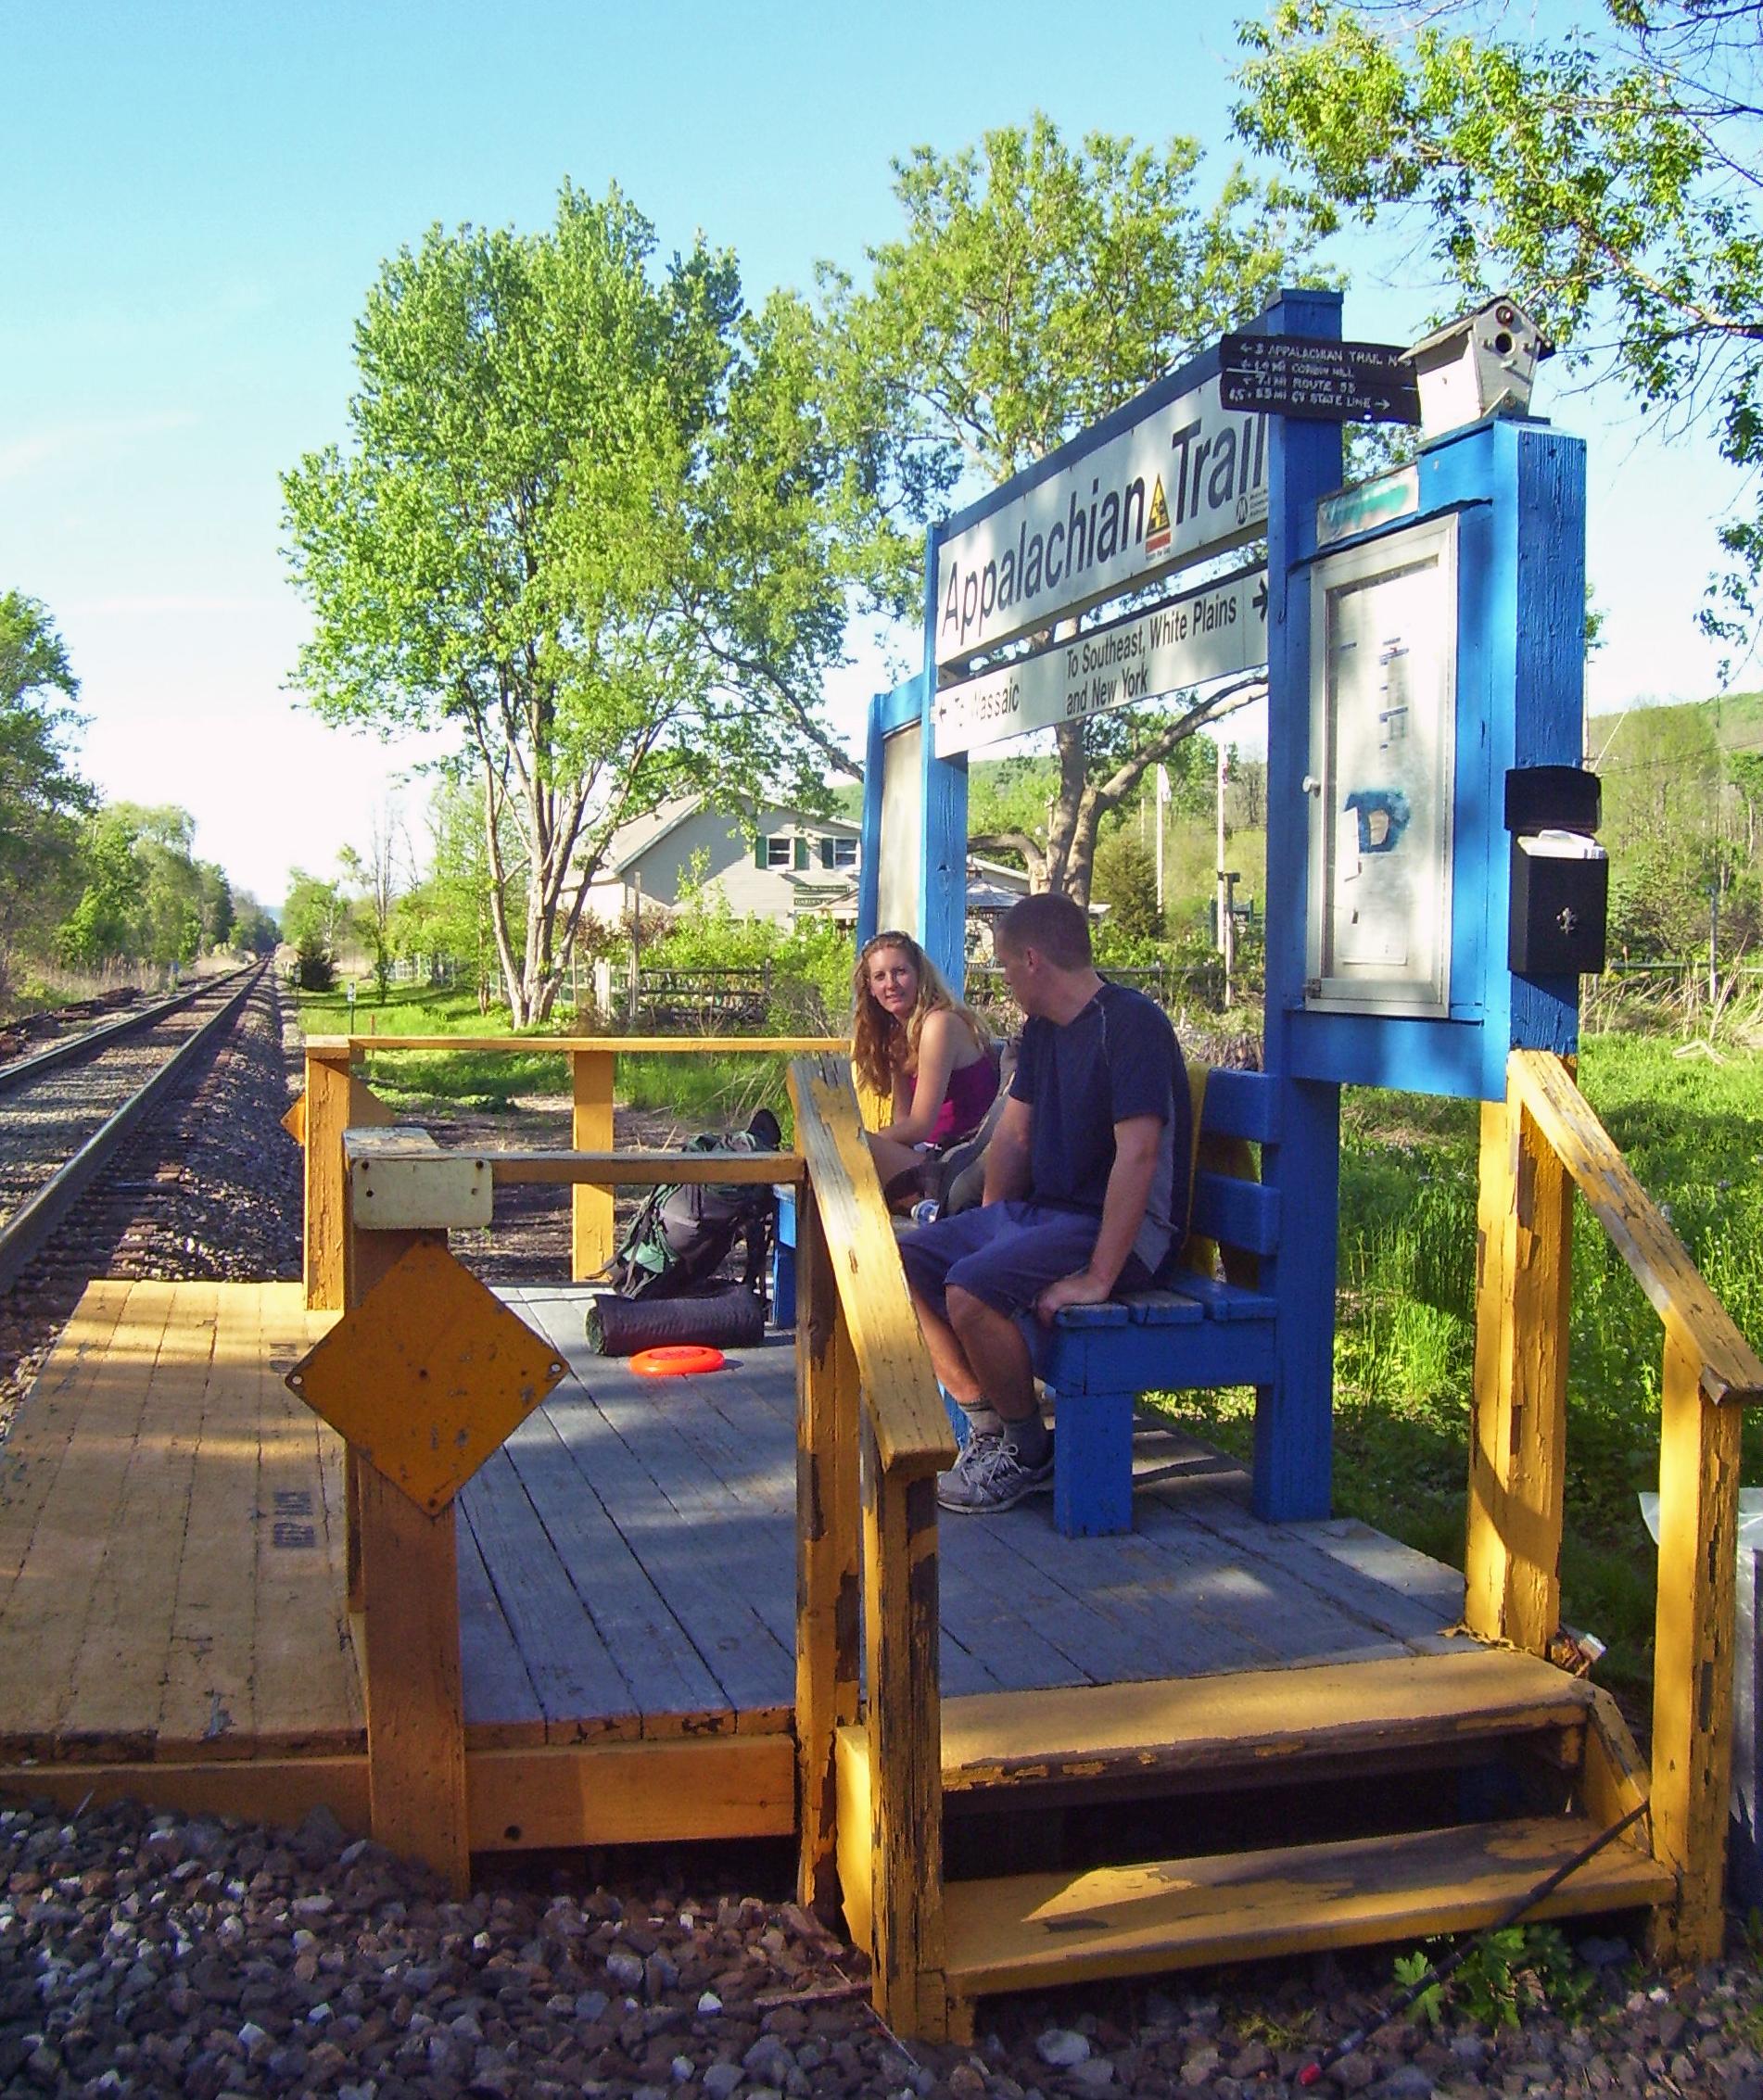 Appalachian Metro Travel Services